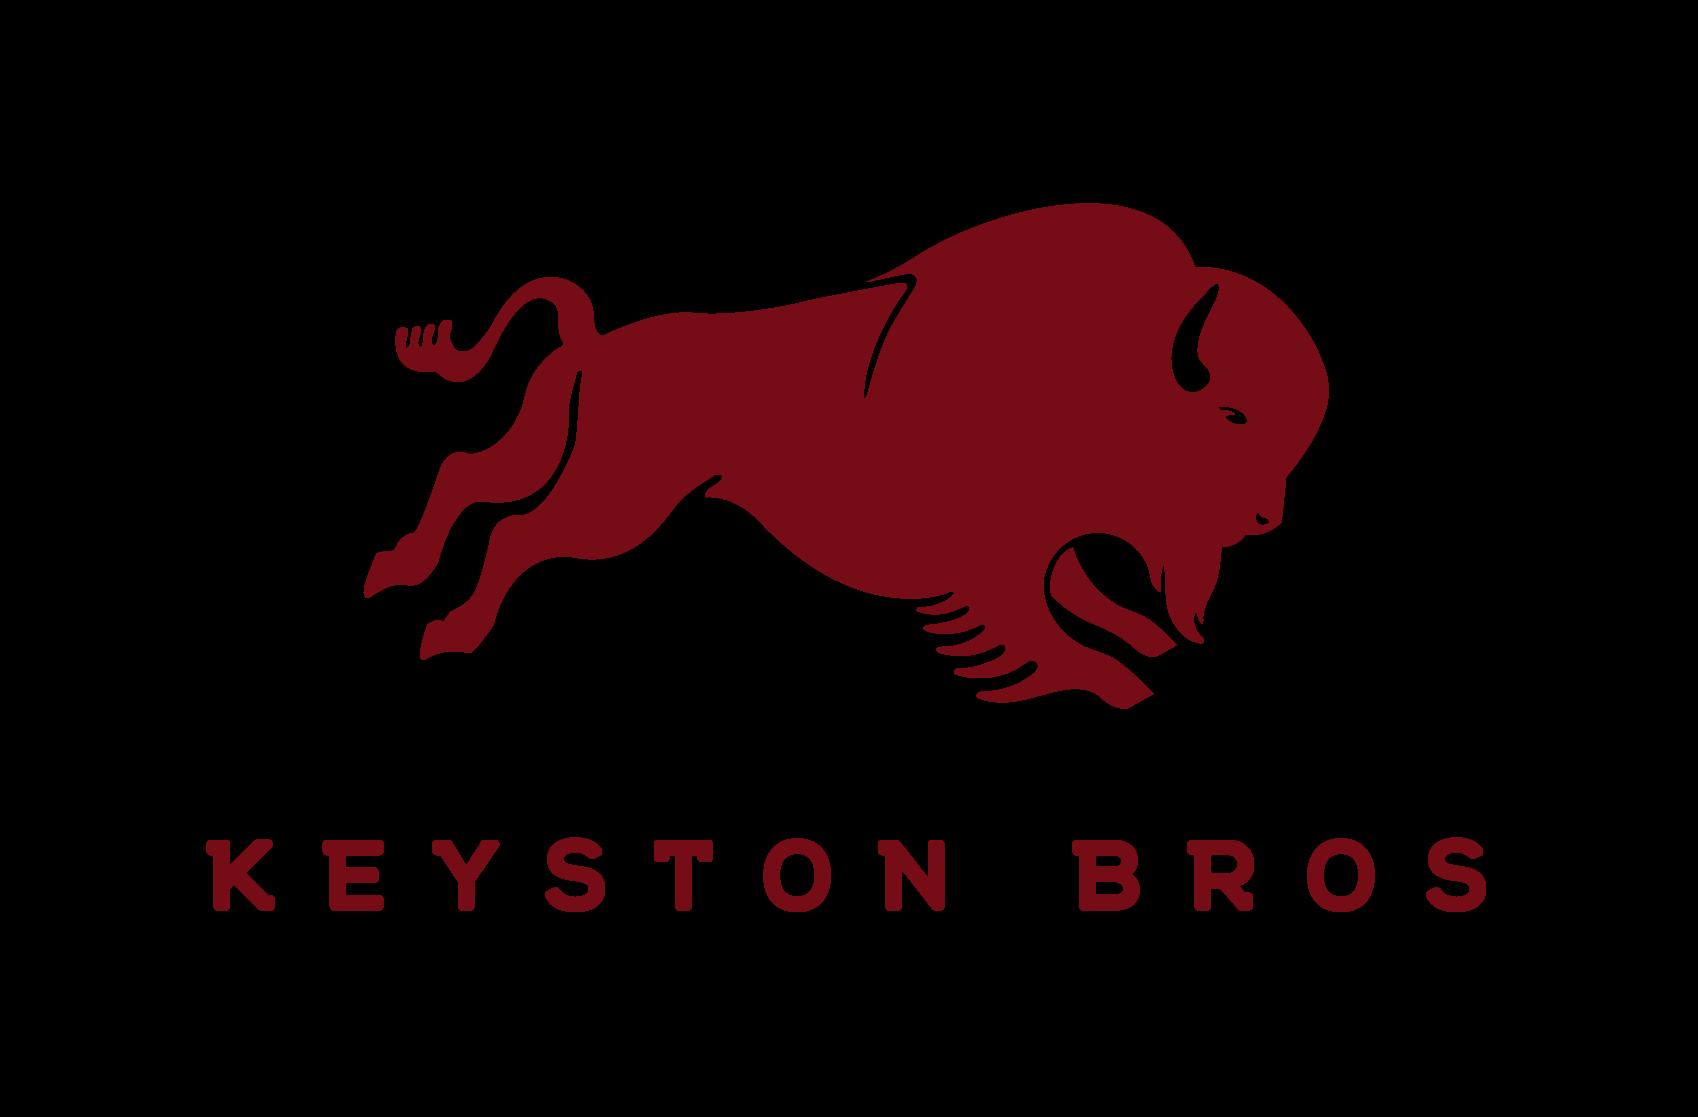 Who is Keyston Bros?